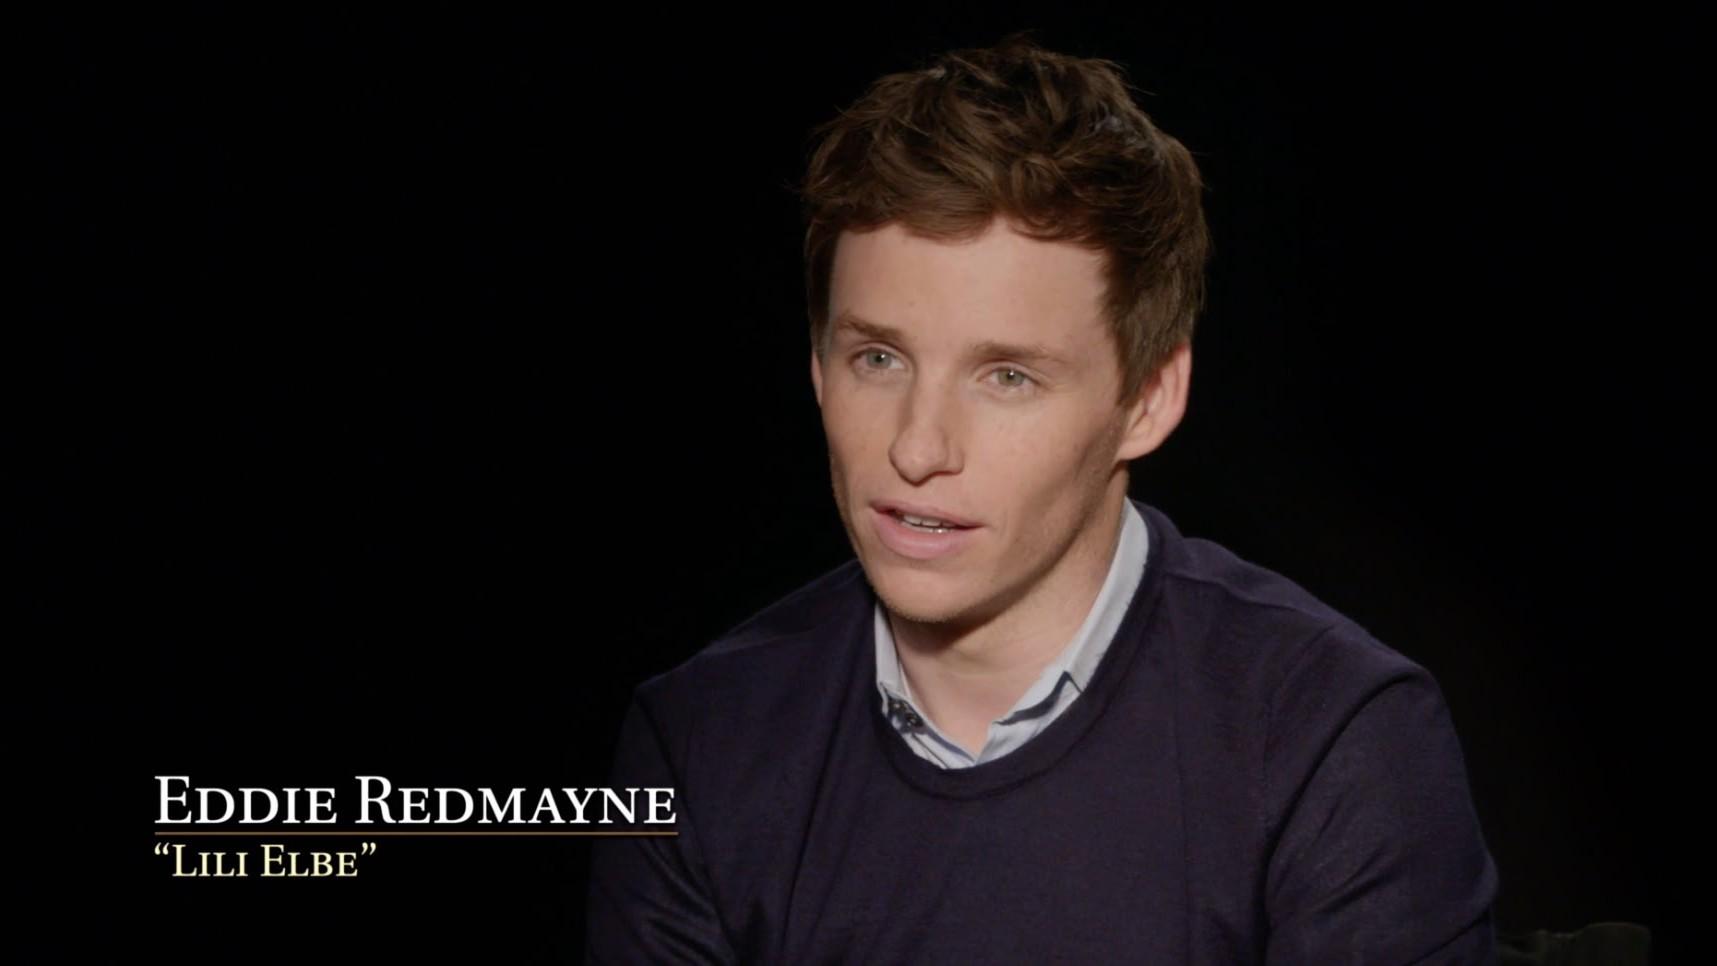 THE DANISH GIRL – 'Eddie Redmayne' Featurette – Now Playing